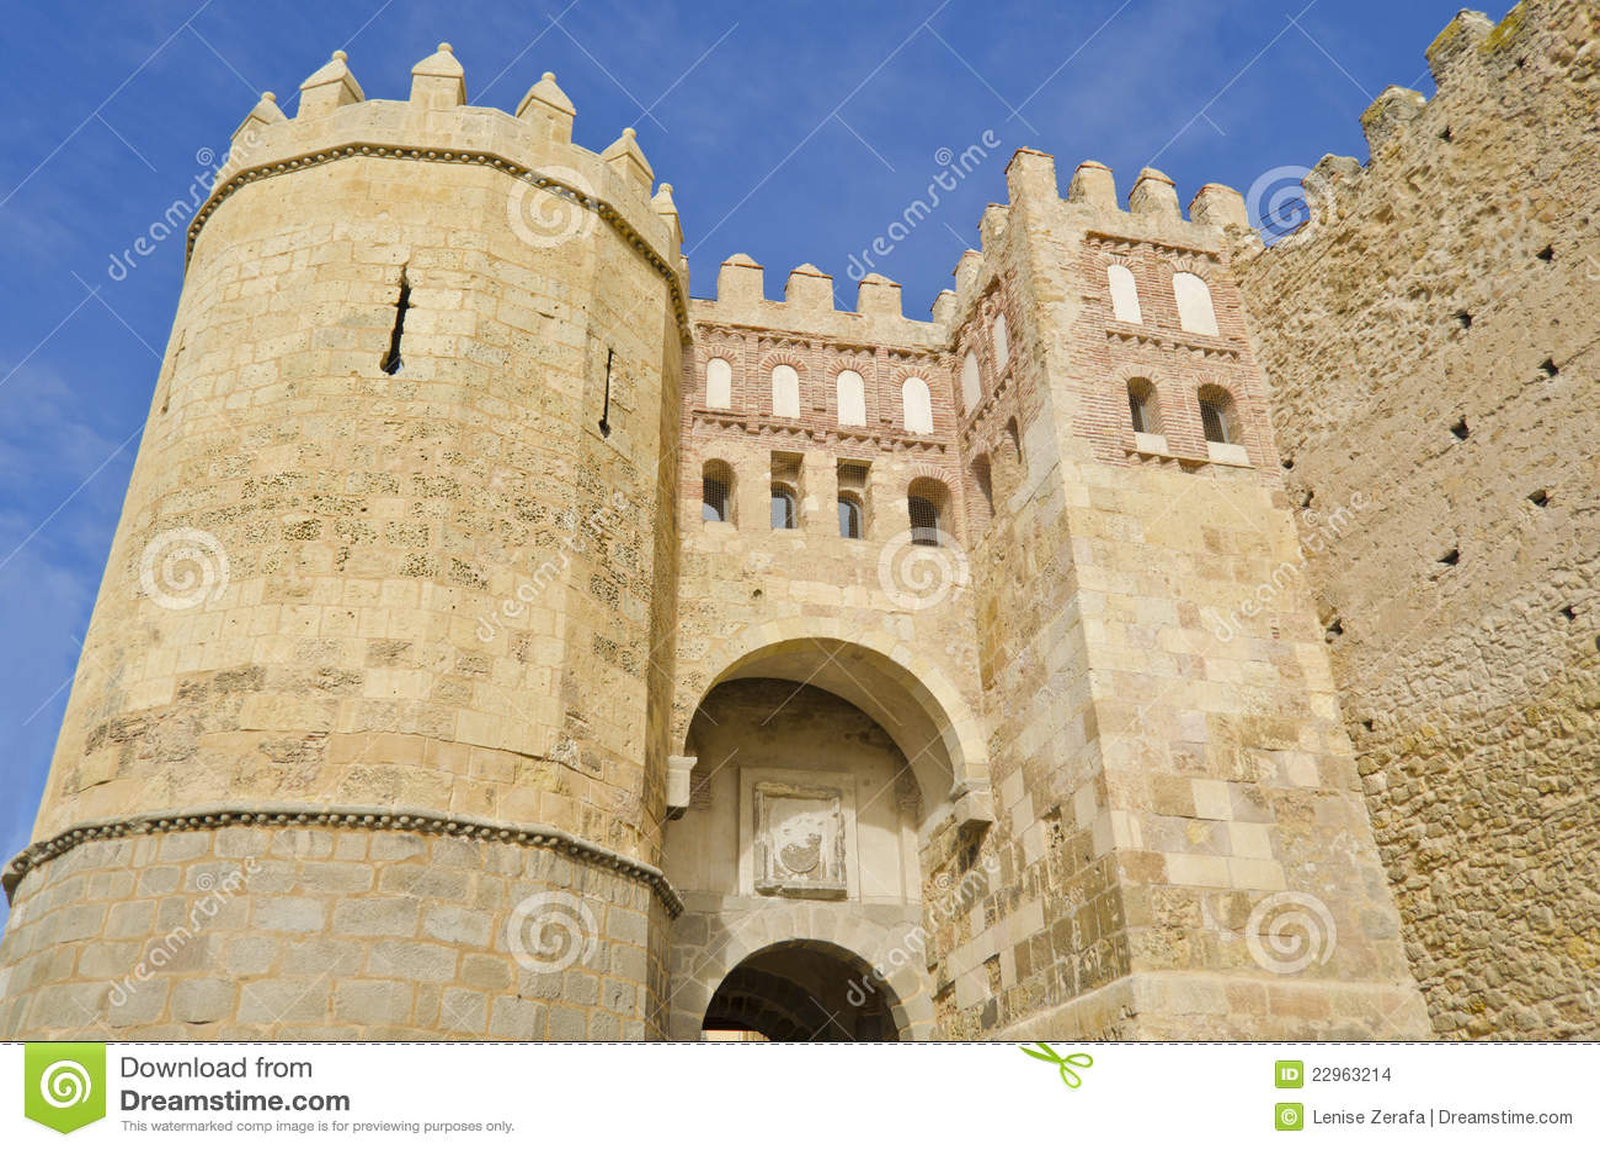 Puerta de san andres in segovia spain stock images - Puerta de segovia ...